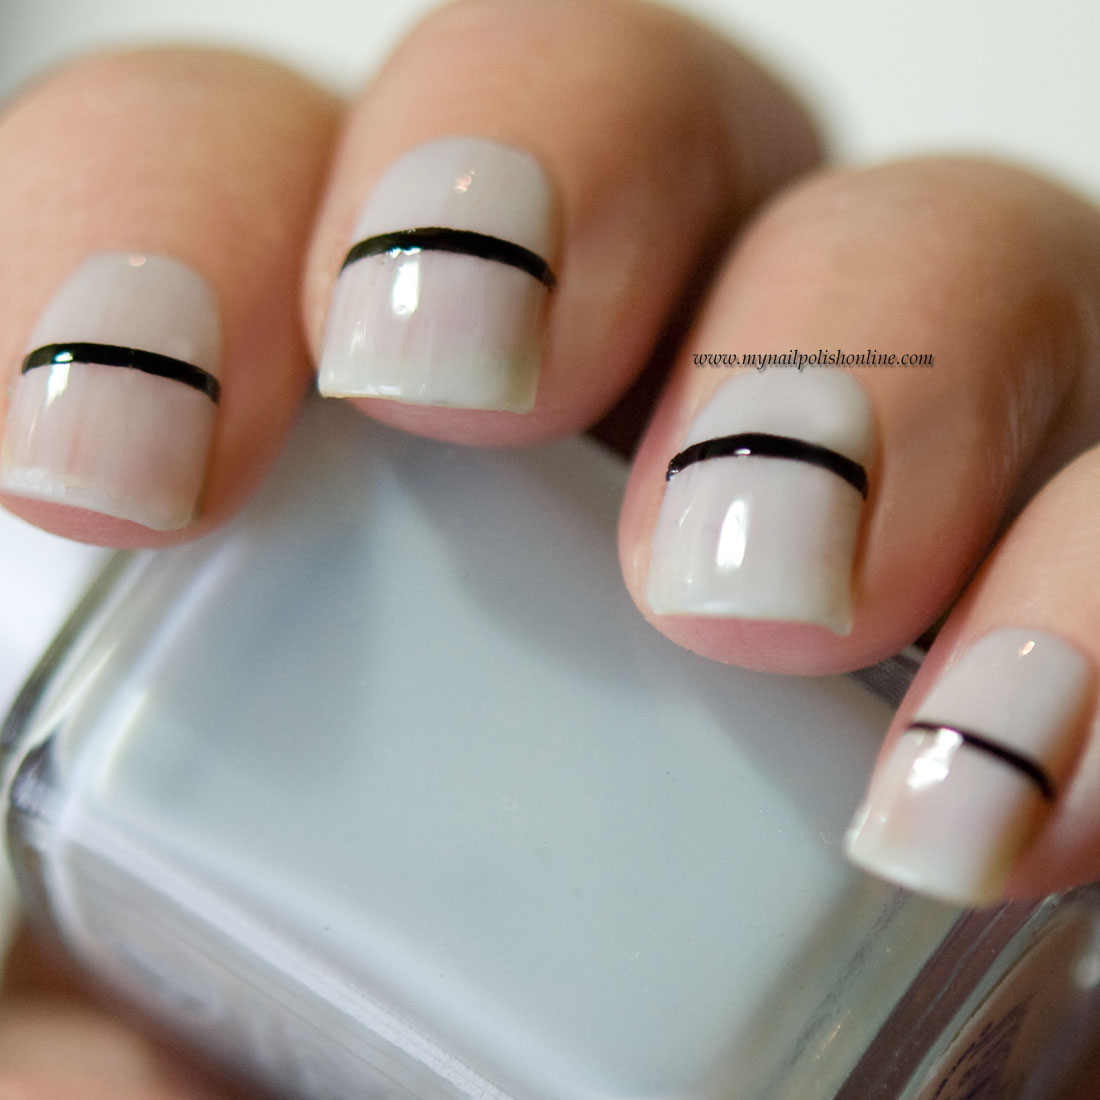 Minimalistic nails, lines